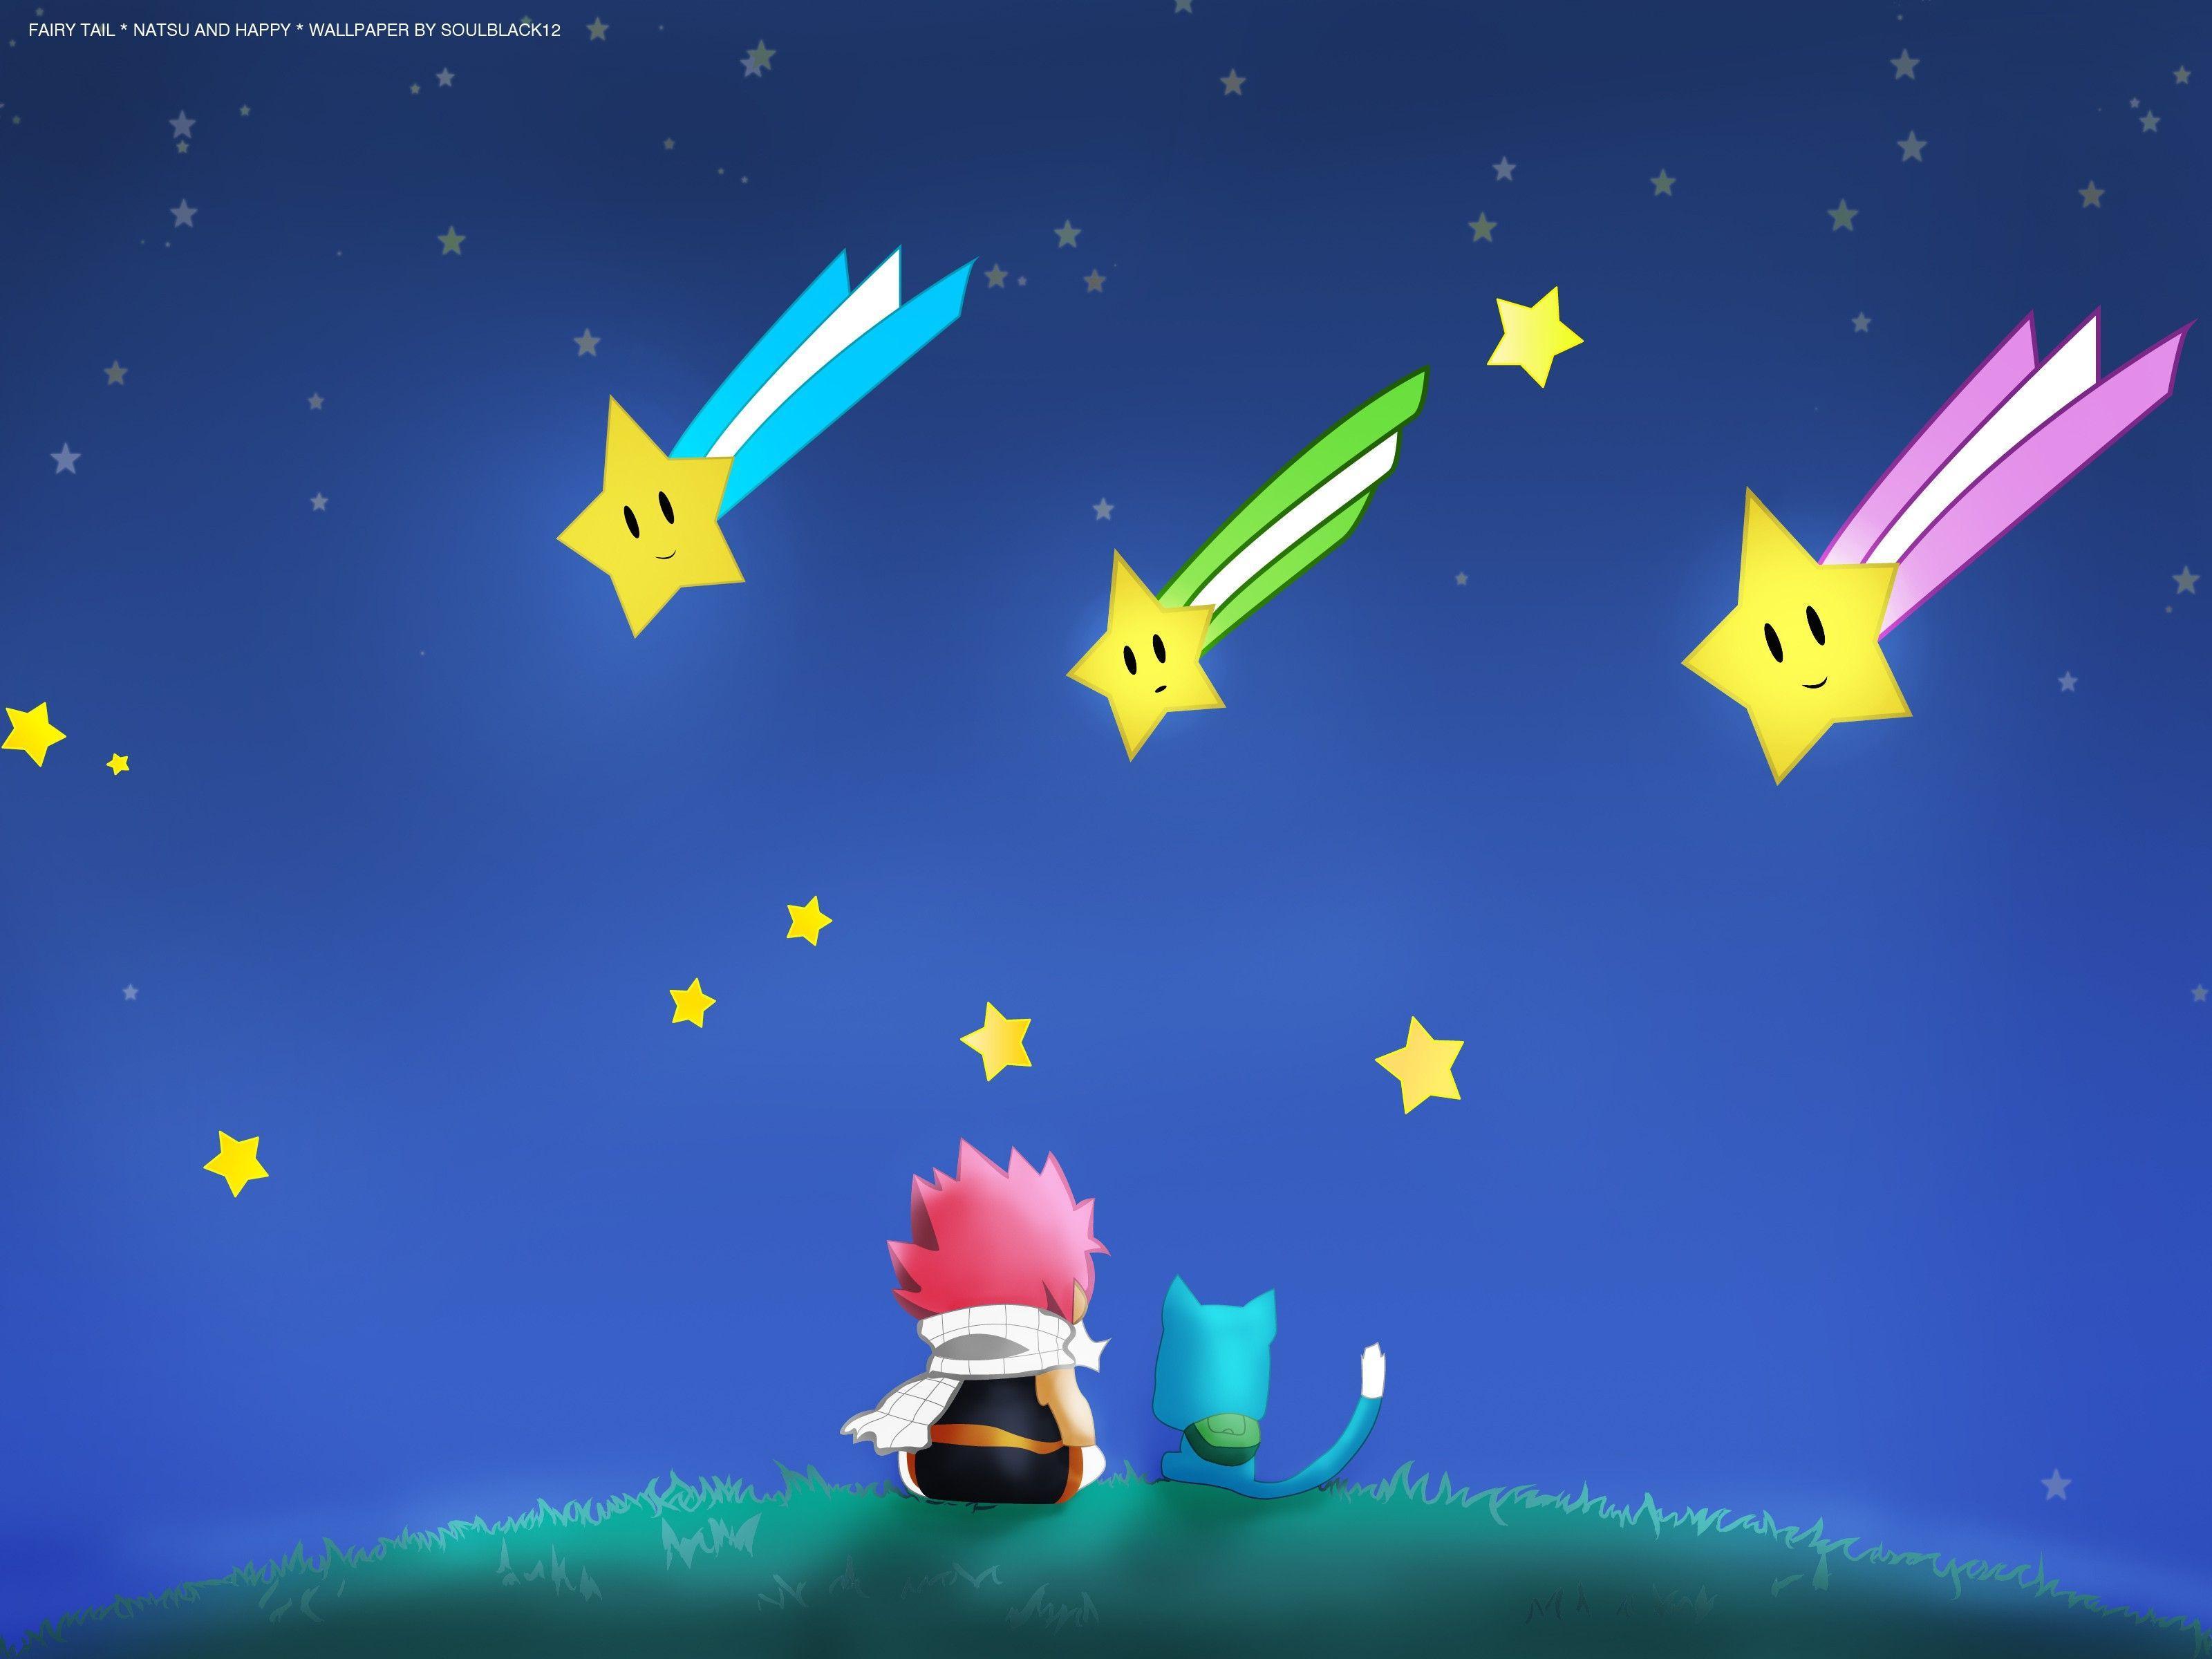 Stars happy fairy tail dragneel natsu anime anime boys manga happy .